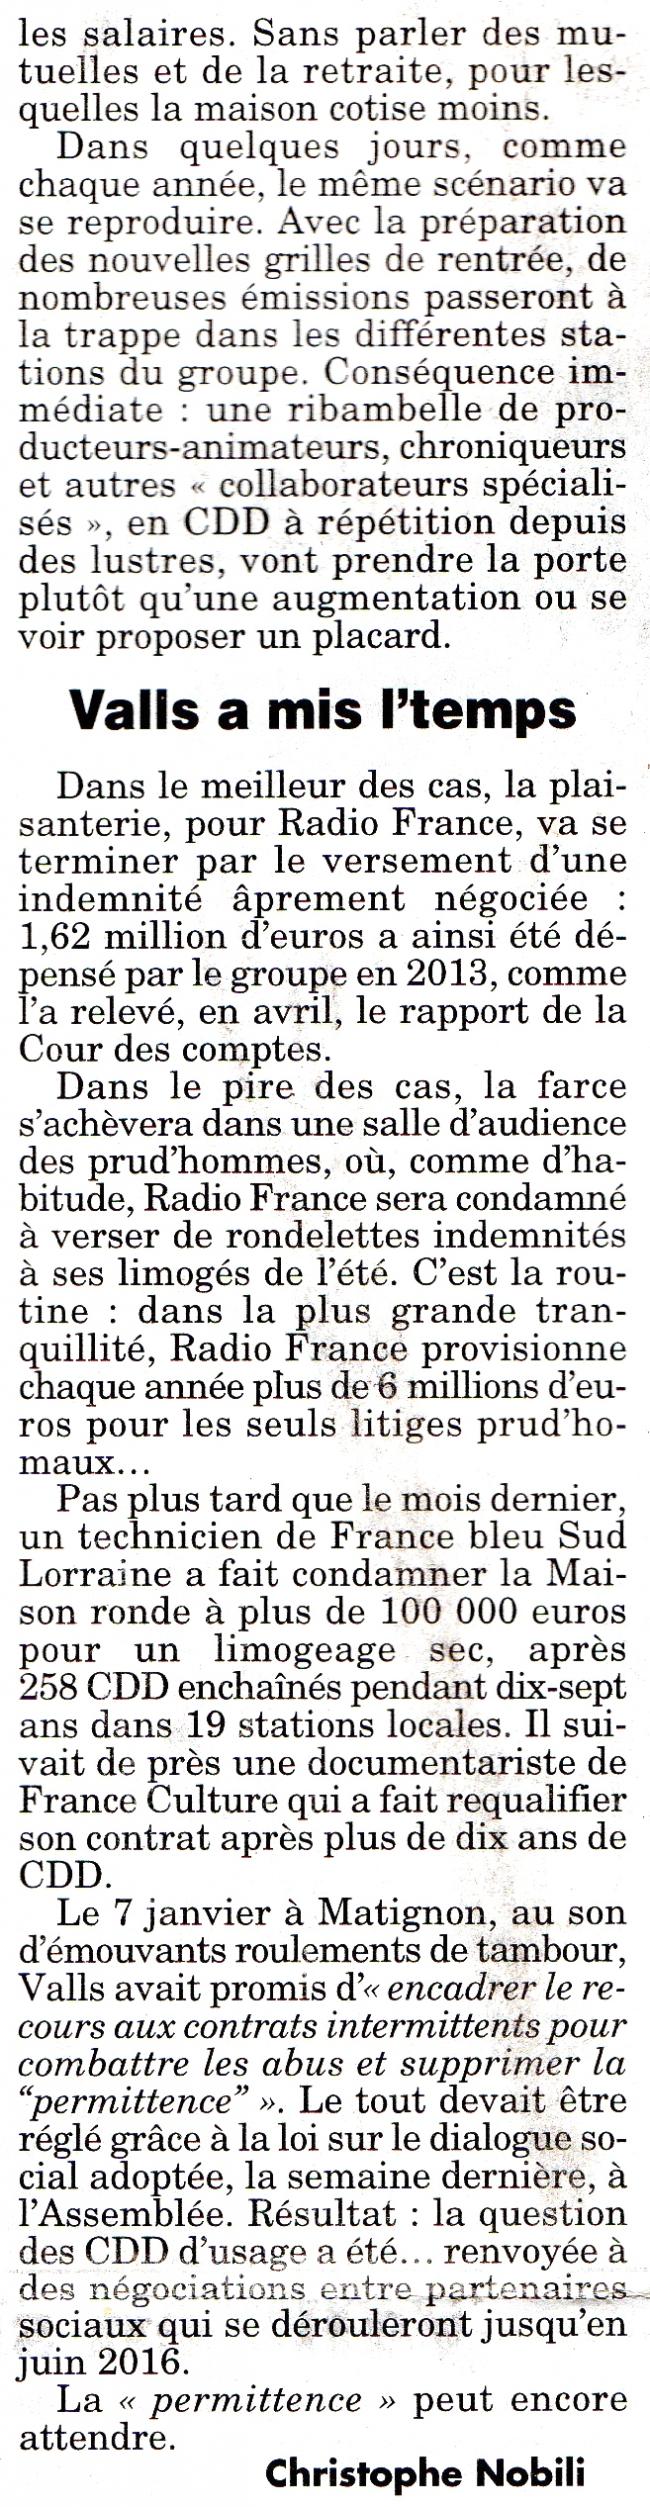 Record battu près de seize mille CDD à Radio France en 2014 2.jpg